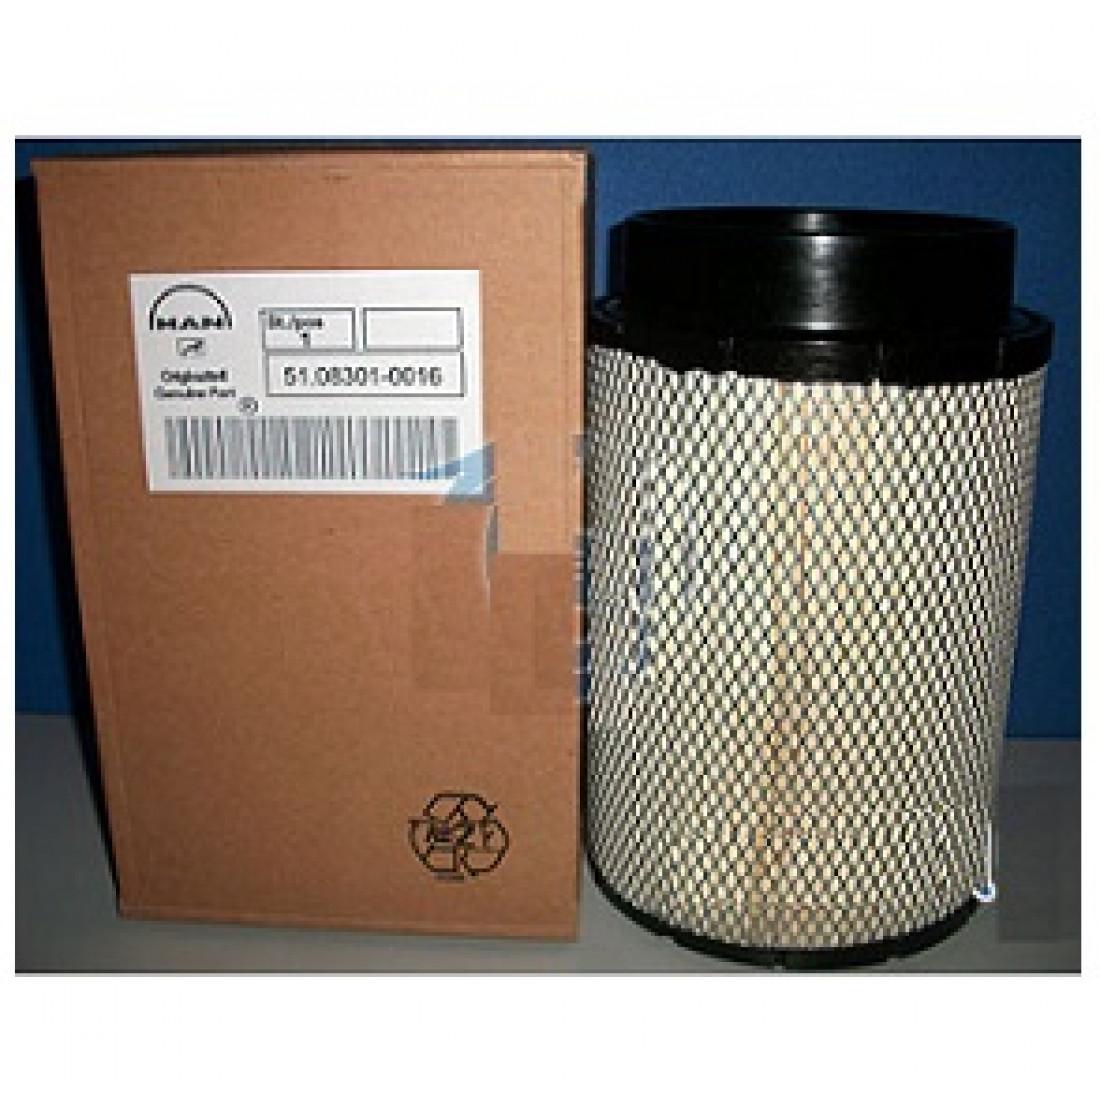 Air Filter 51 08301-0016